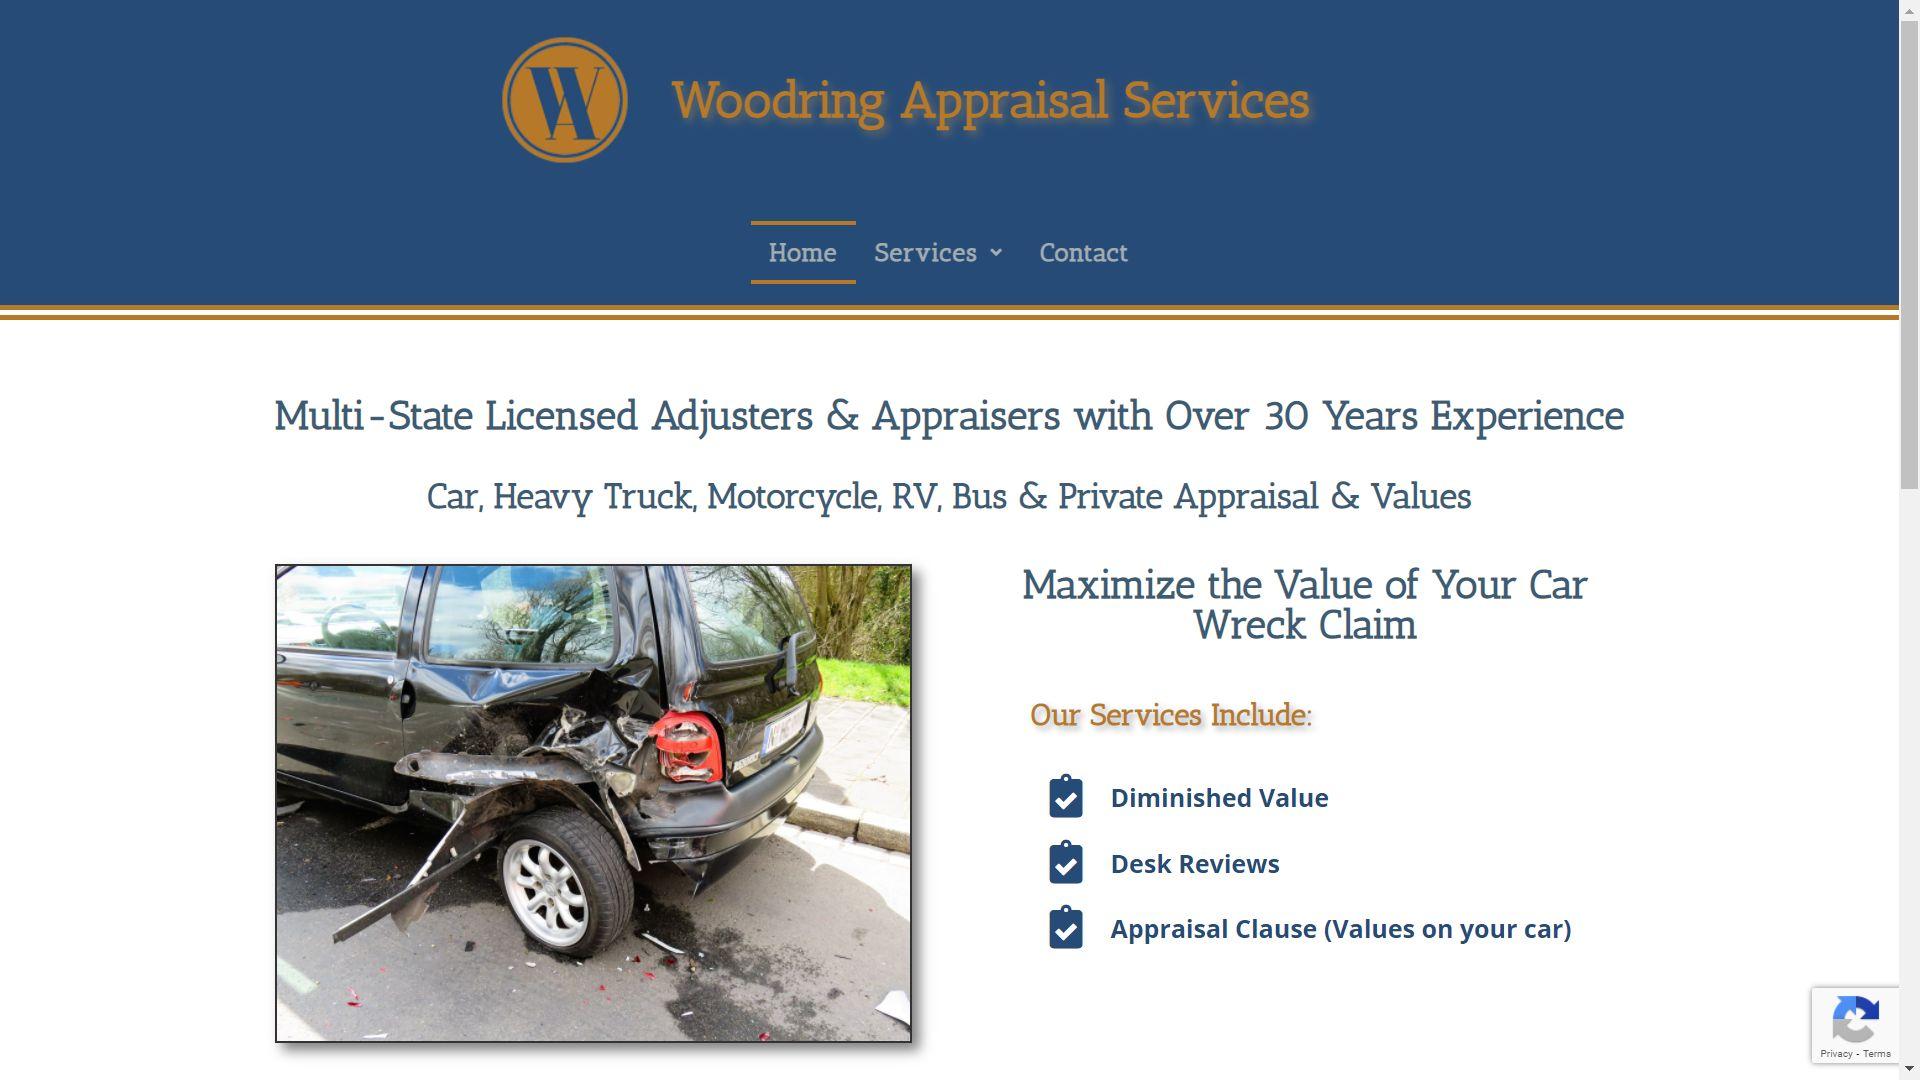 woodringappraisal